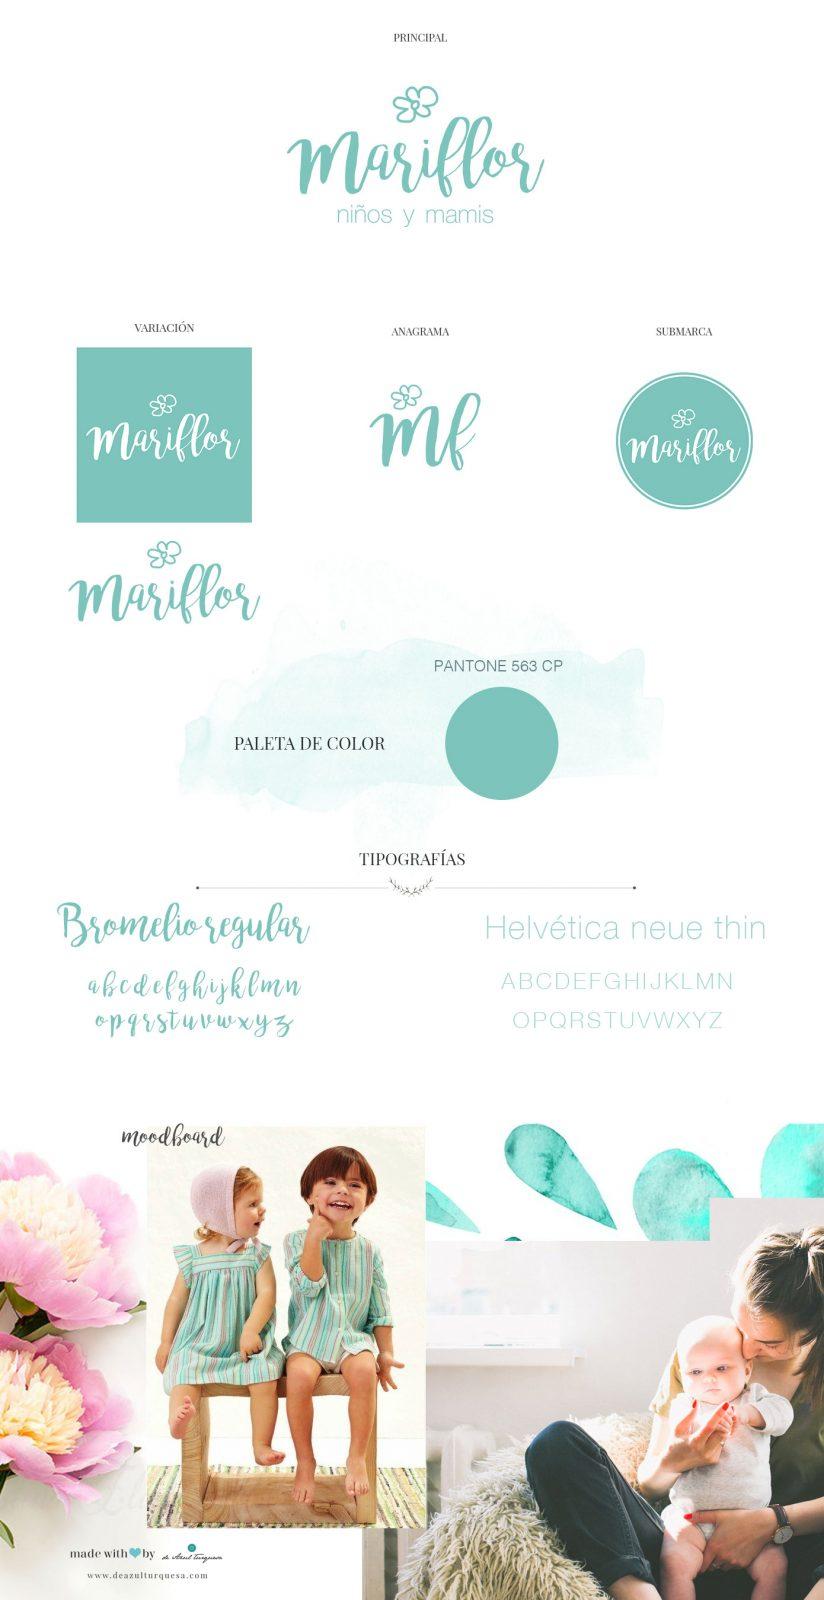 mariflor diseño de logos